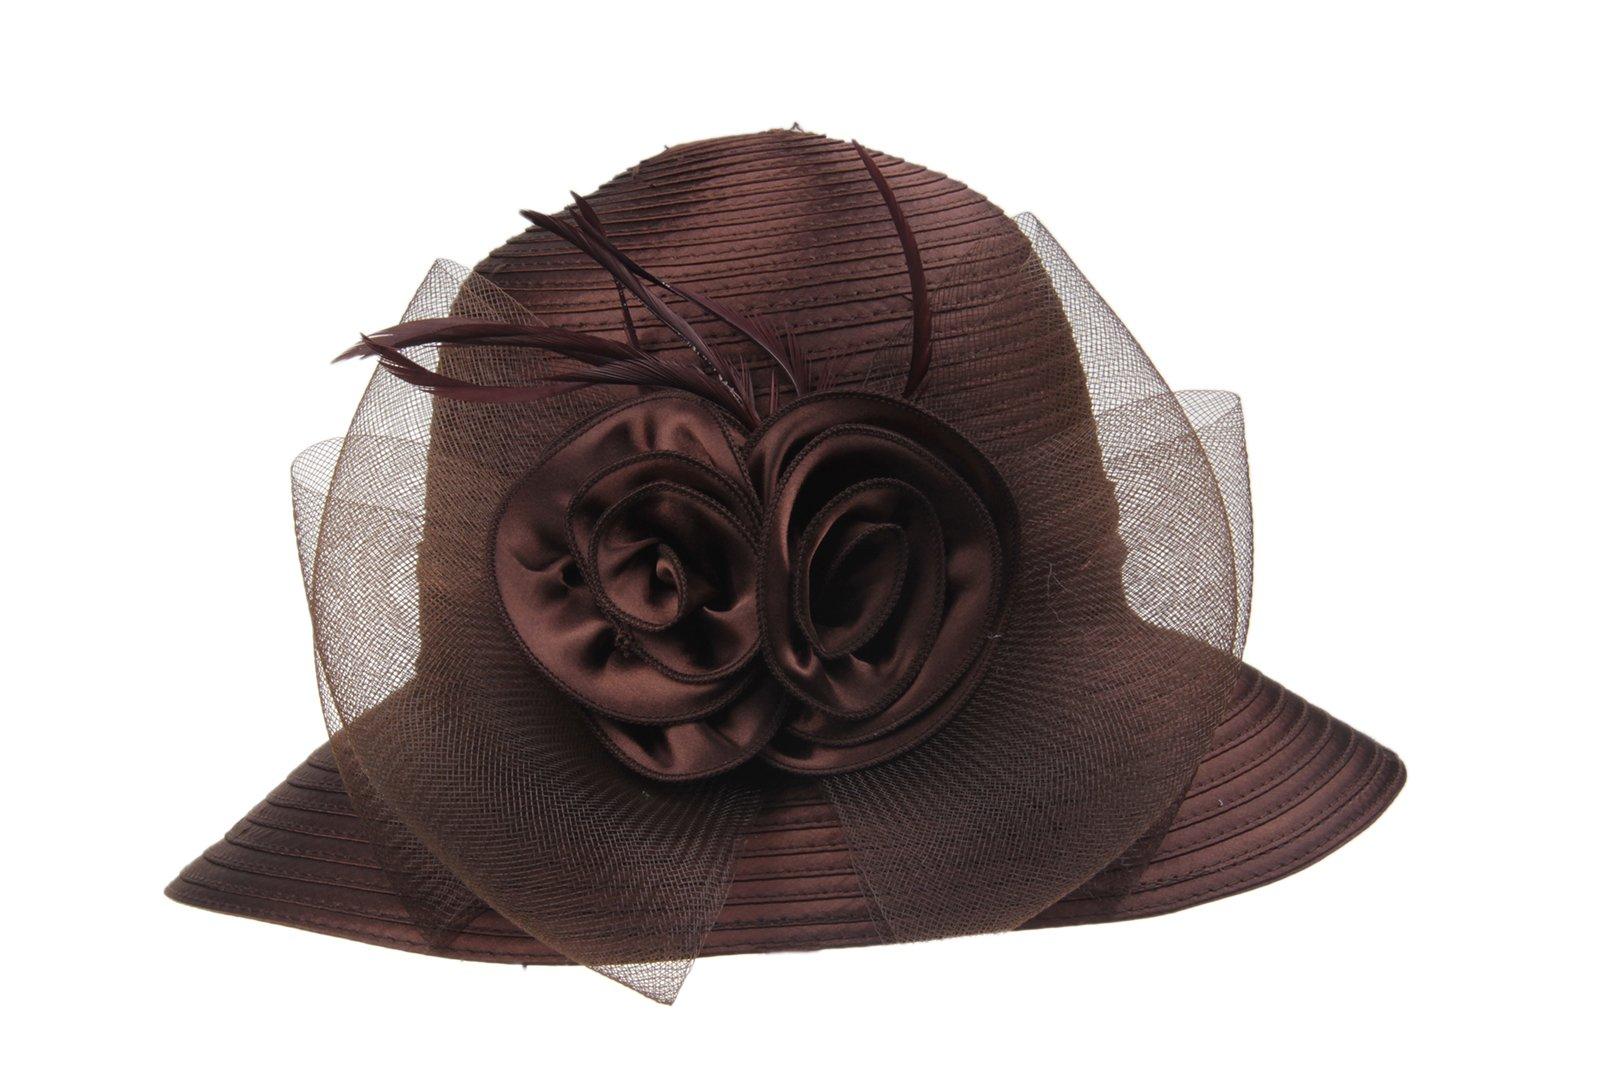 Prefe Lady's Kentucky Derby Dress Church Cloche Hat Bow Bucket Wedding Bowler Hats (Brown, One Size)